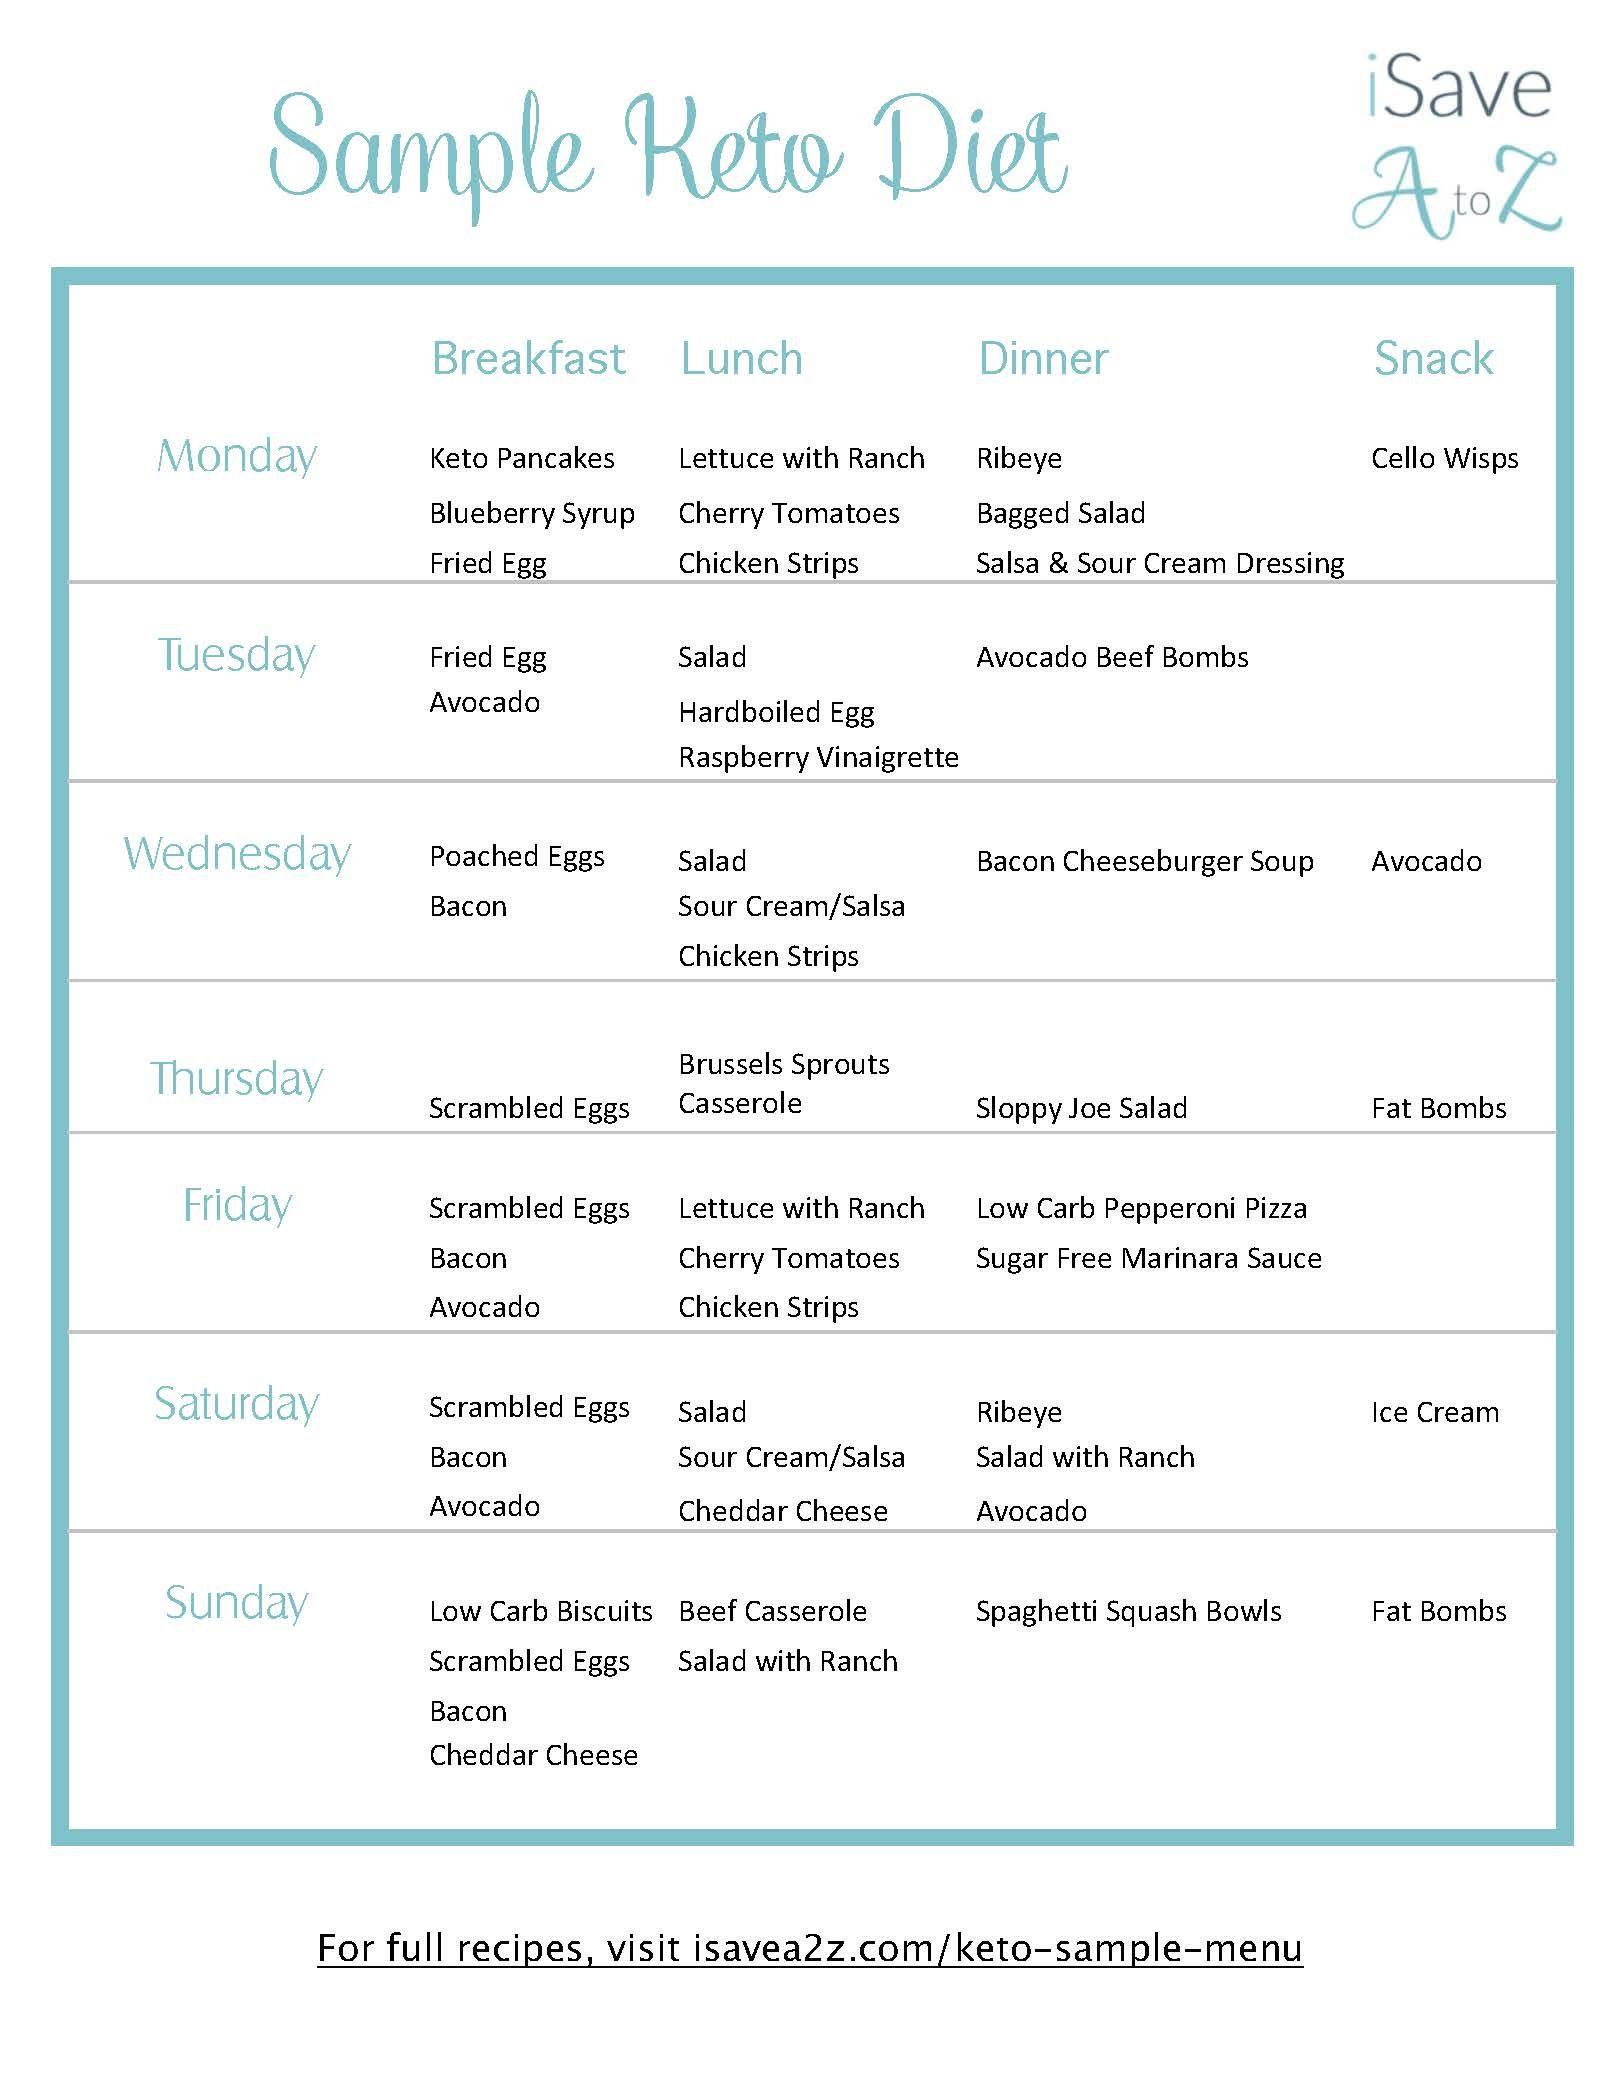 Grab This Printable 7 Day Keto Sample Menu Plan   Recipes - Free Printable Atkins Diet Plan